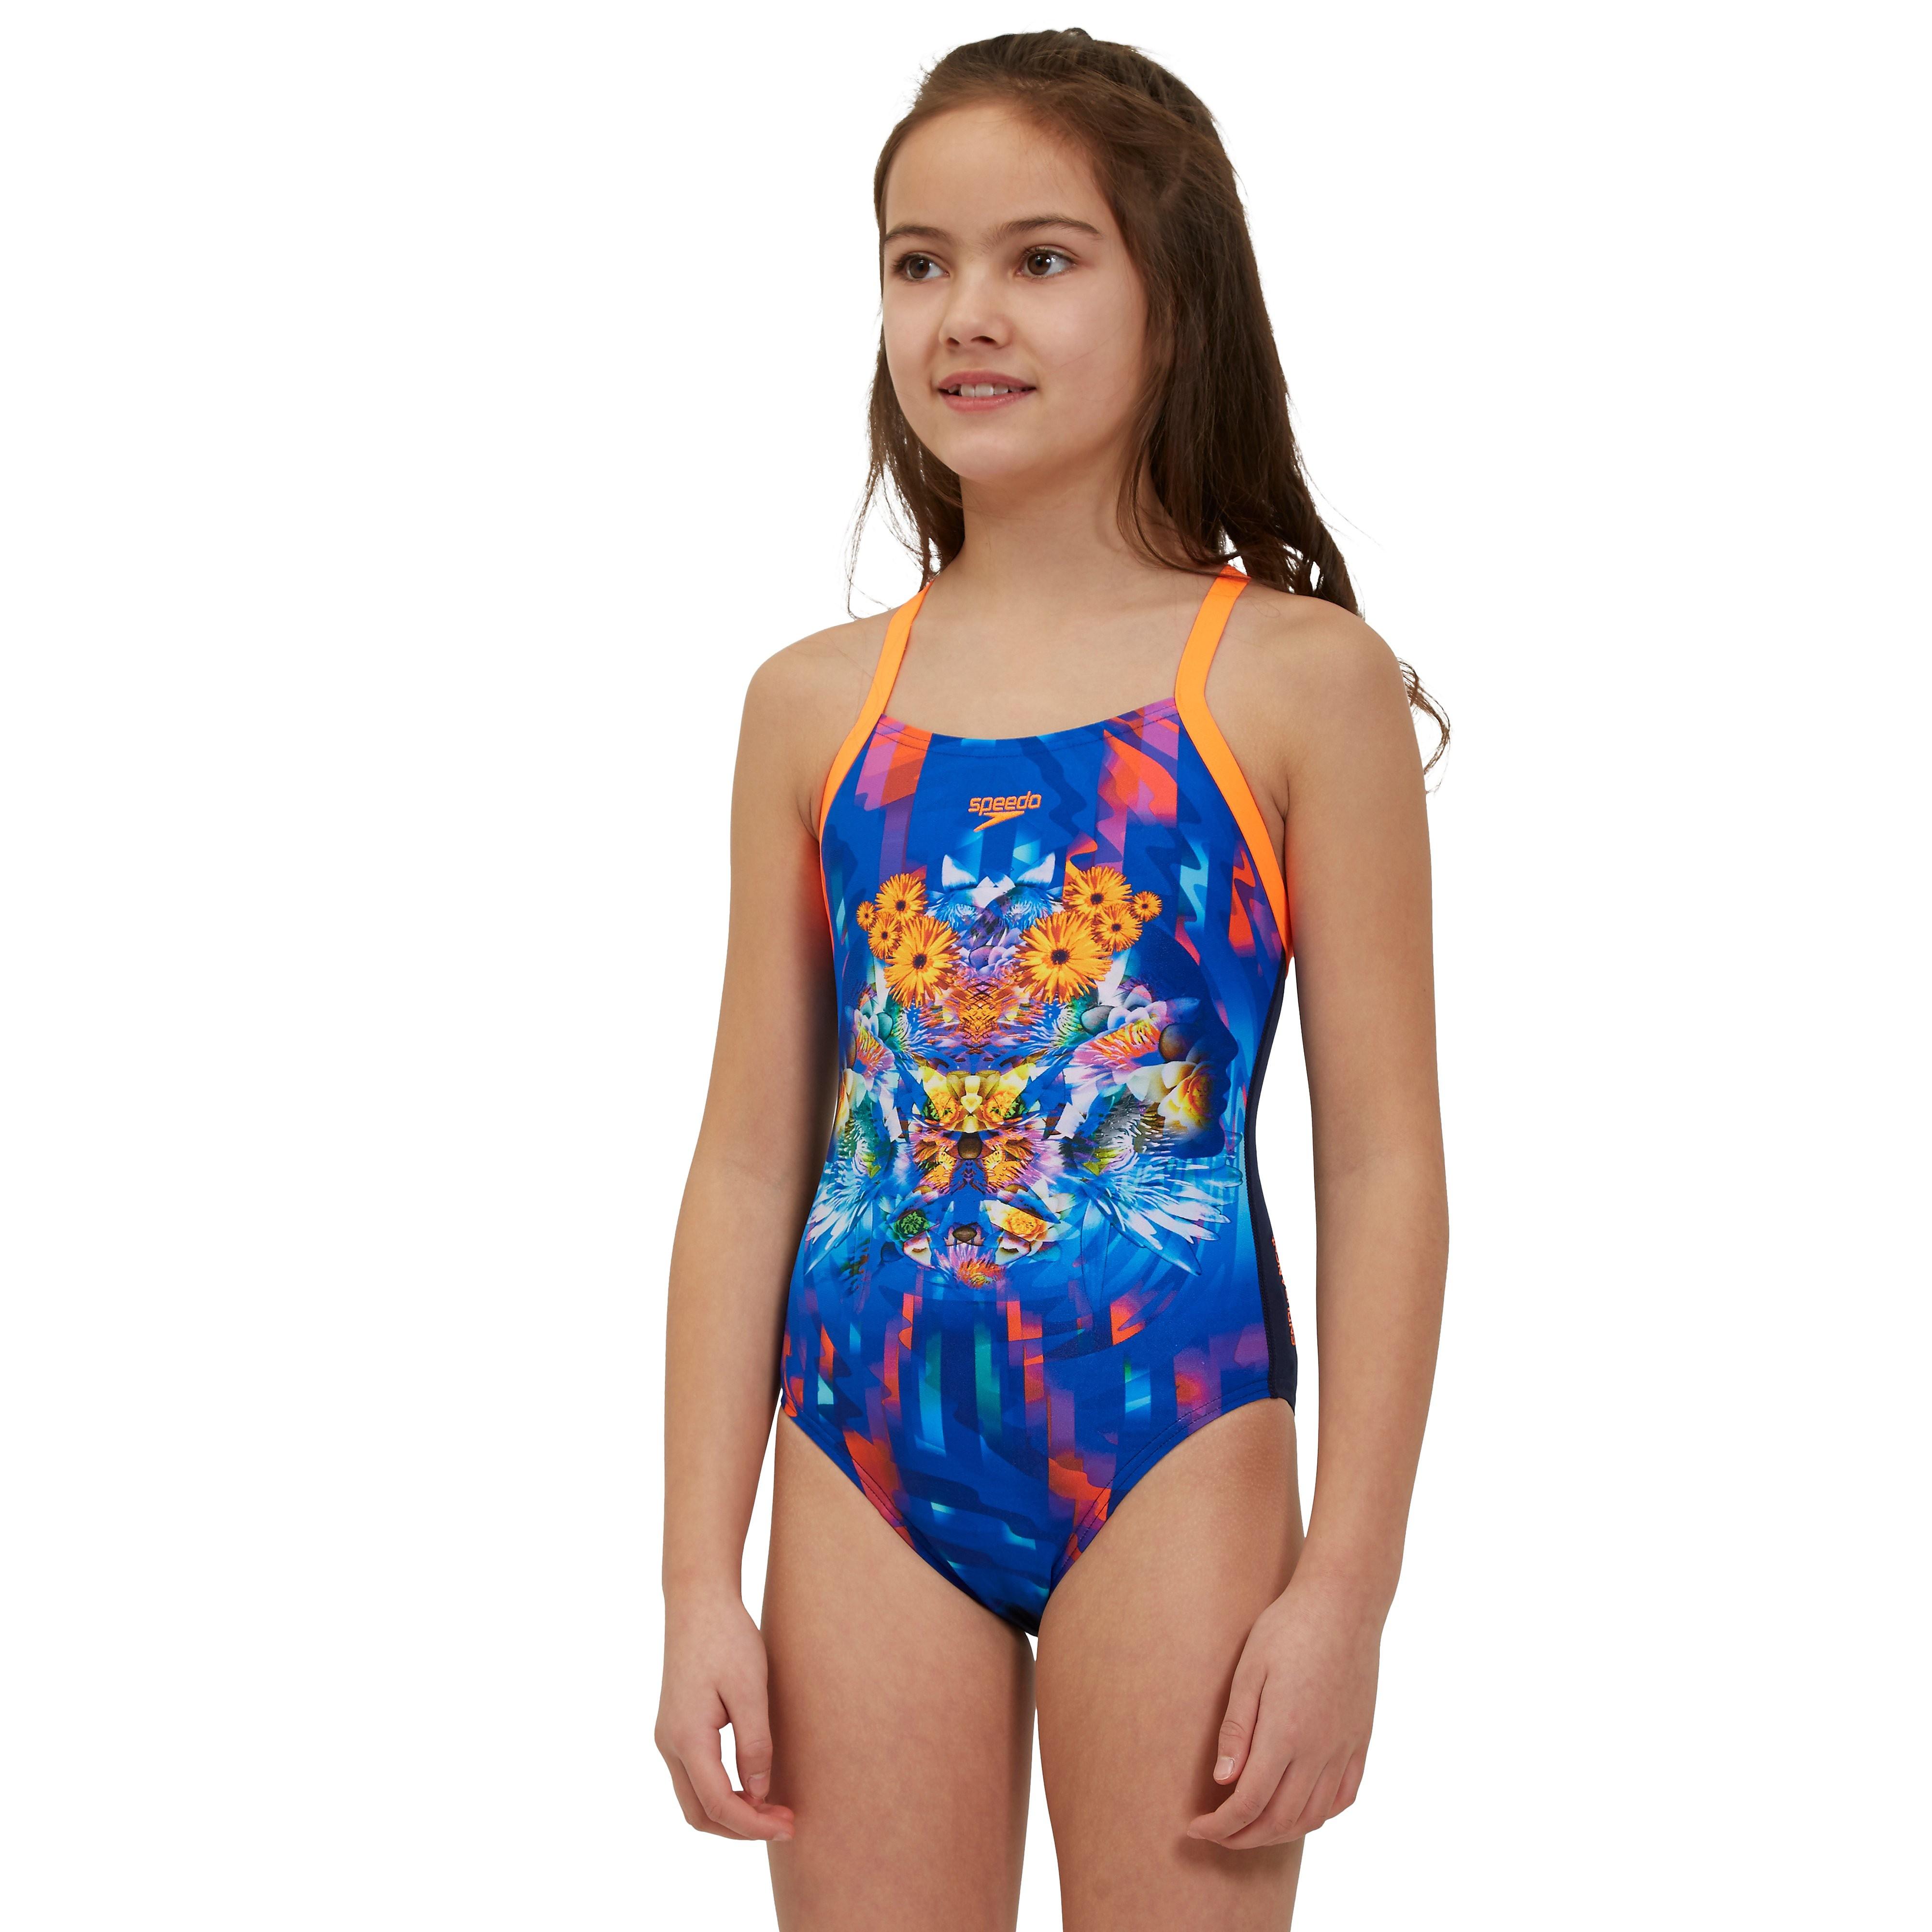 Speedo Dreamscape Digital Cross Back Junior Swimsuit